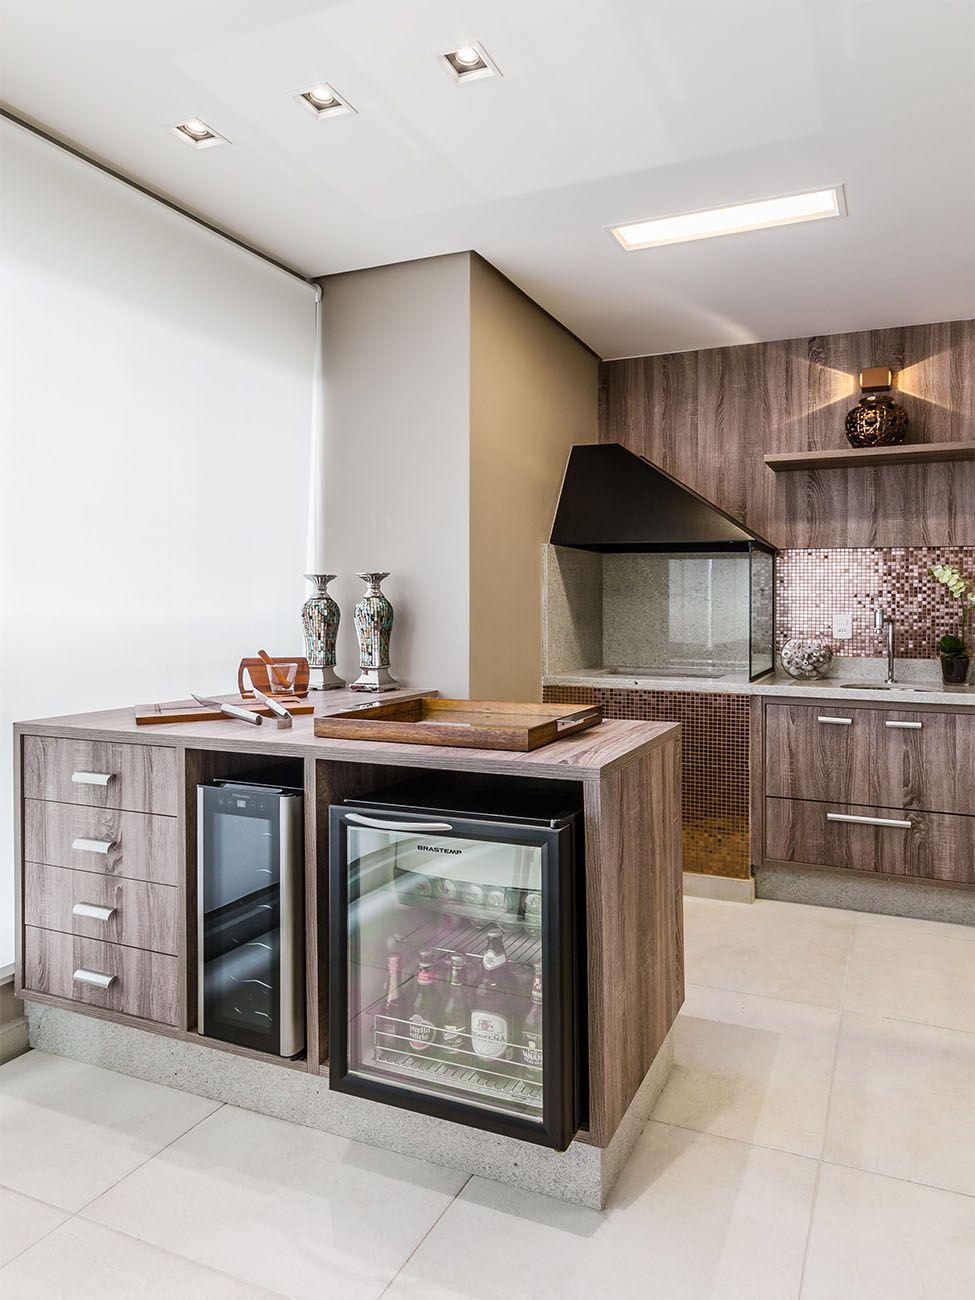 Armario Giratorio Definicion ~ Gostei do aproveitamento da bancada para colocar adega e frigobar Varanda gourmet Pinterest